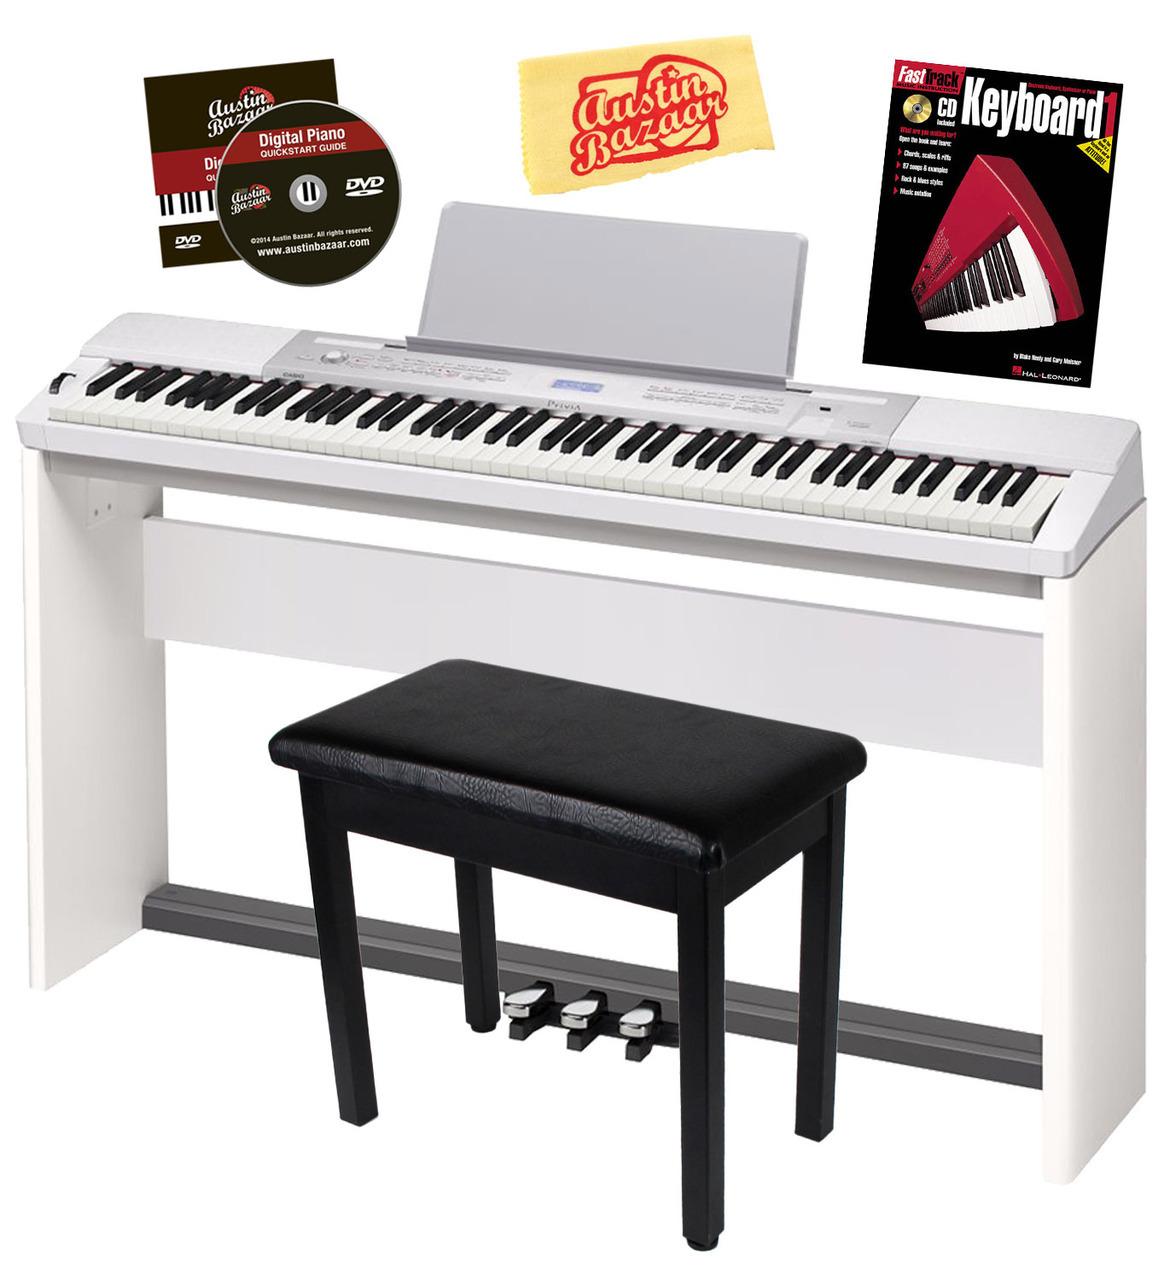 casio privia px 350 digital piano white w cs 67 stand sp 33 pedal ebay. Black Bedroom Furniture Sets. Home Design Ideas